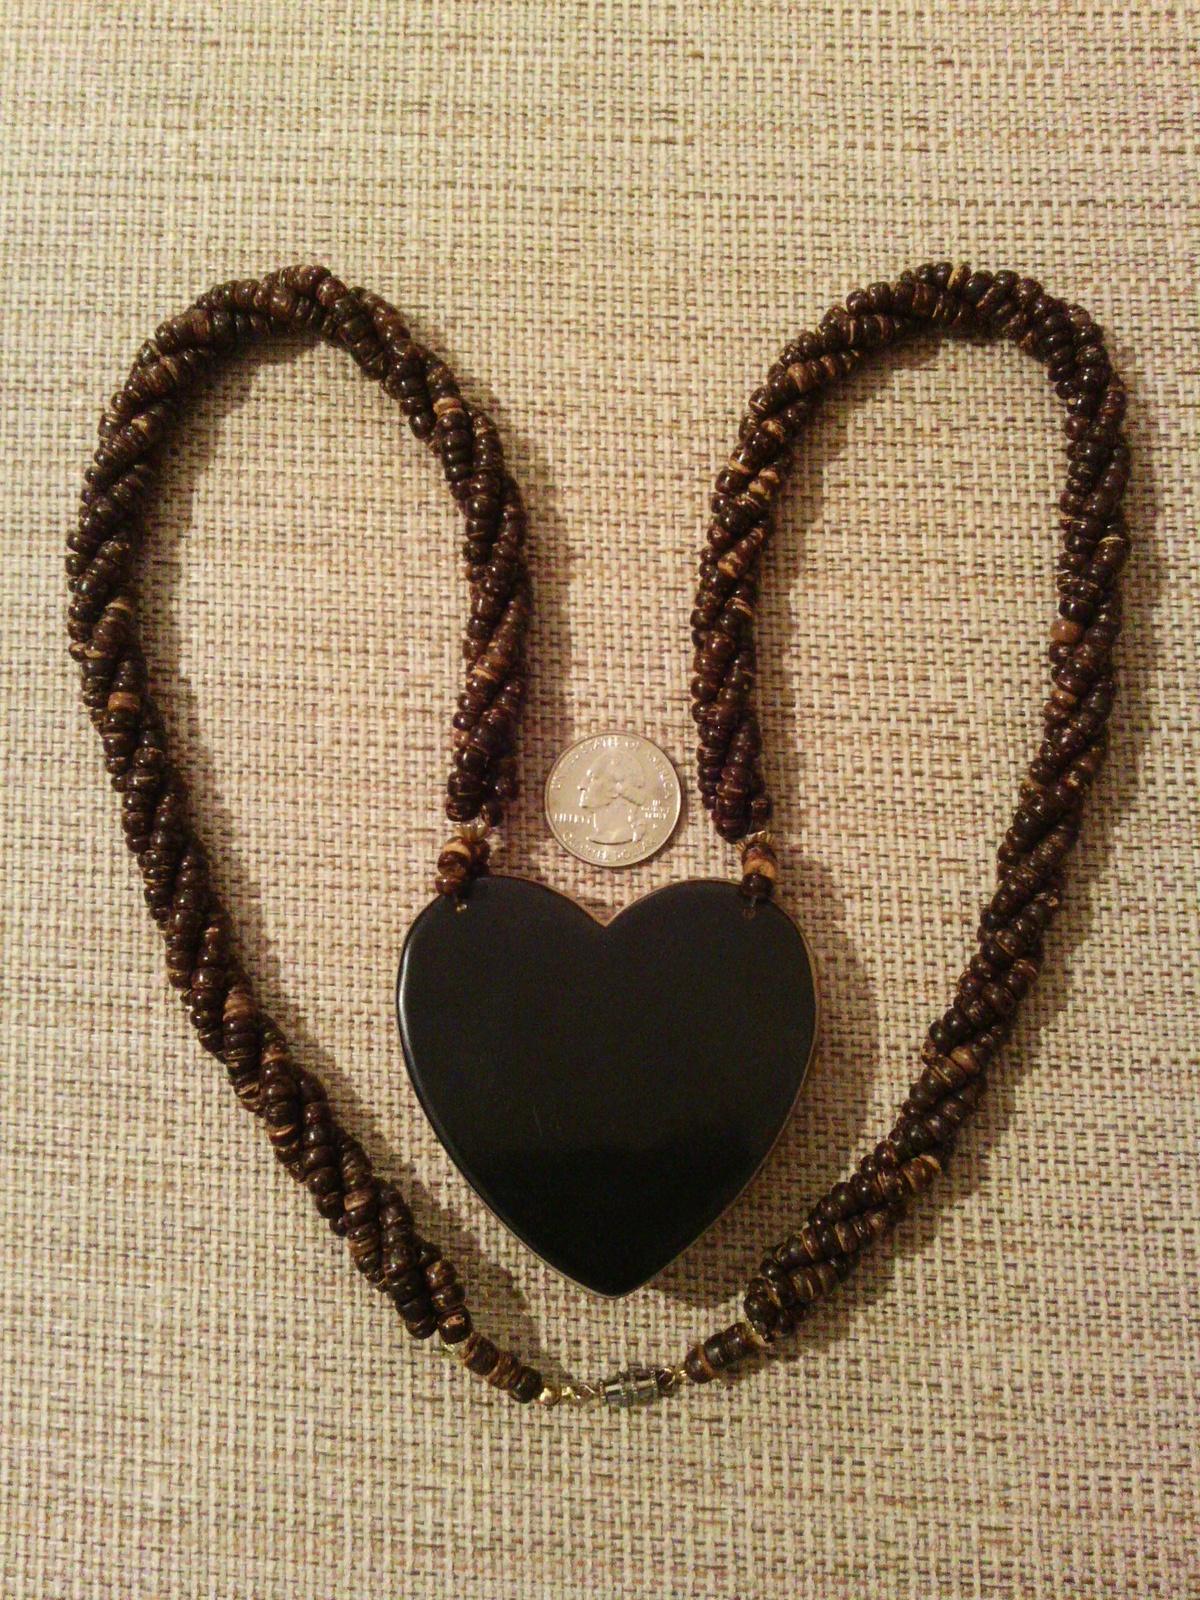 Heart Shaped Pink Abalone Shell Mosaic Wood Bead Necklace